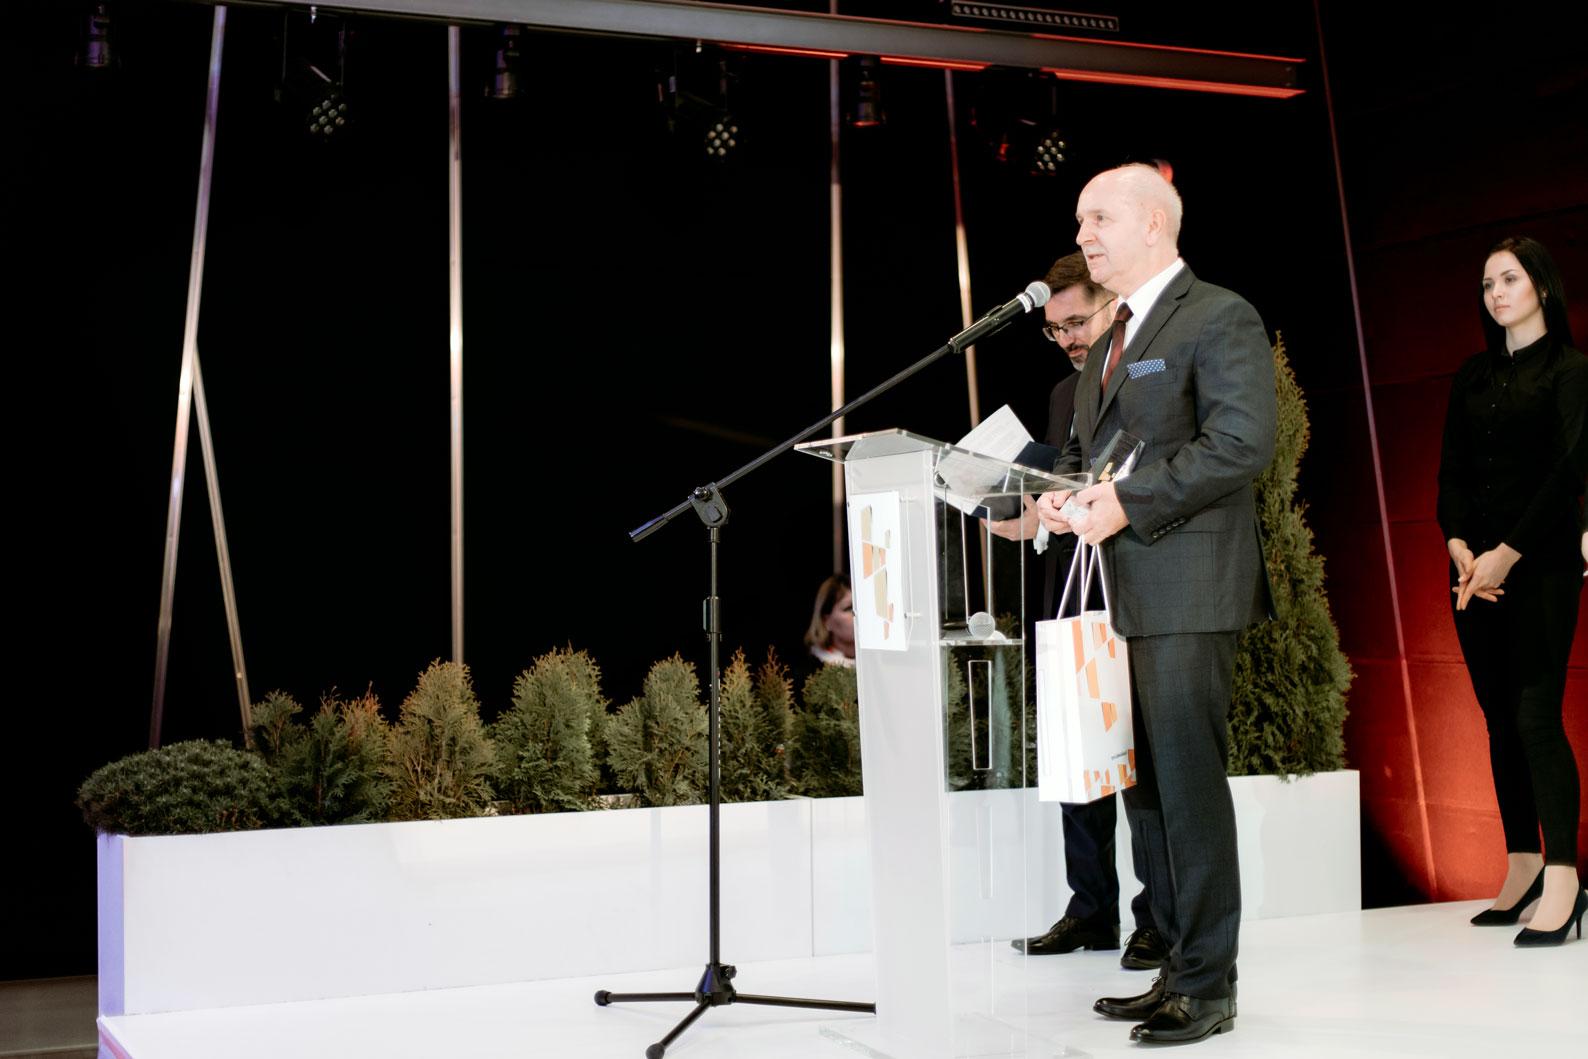 Henryk Kartaszyński's speech on the gala.